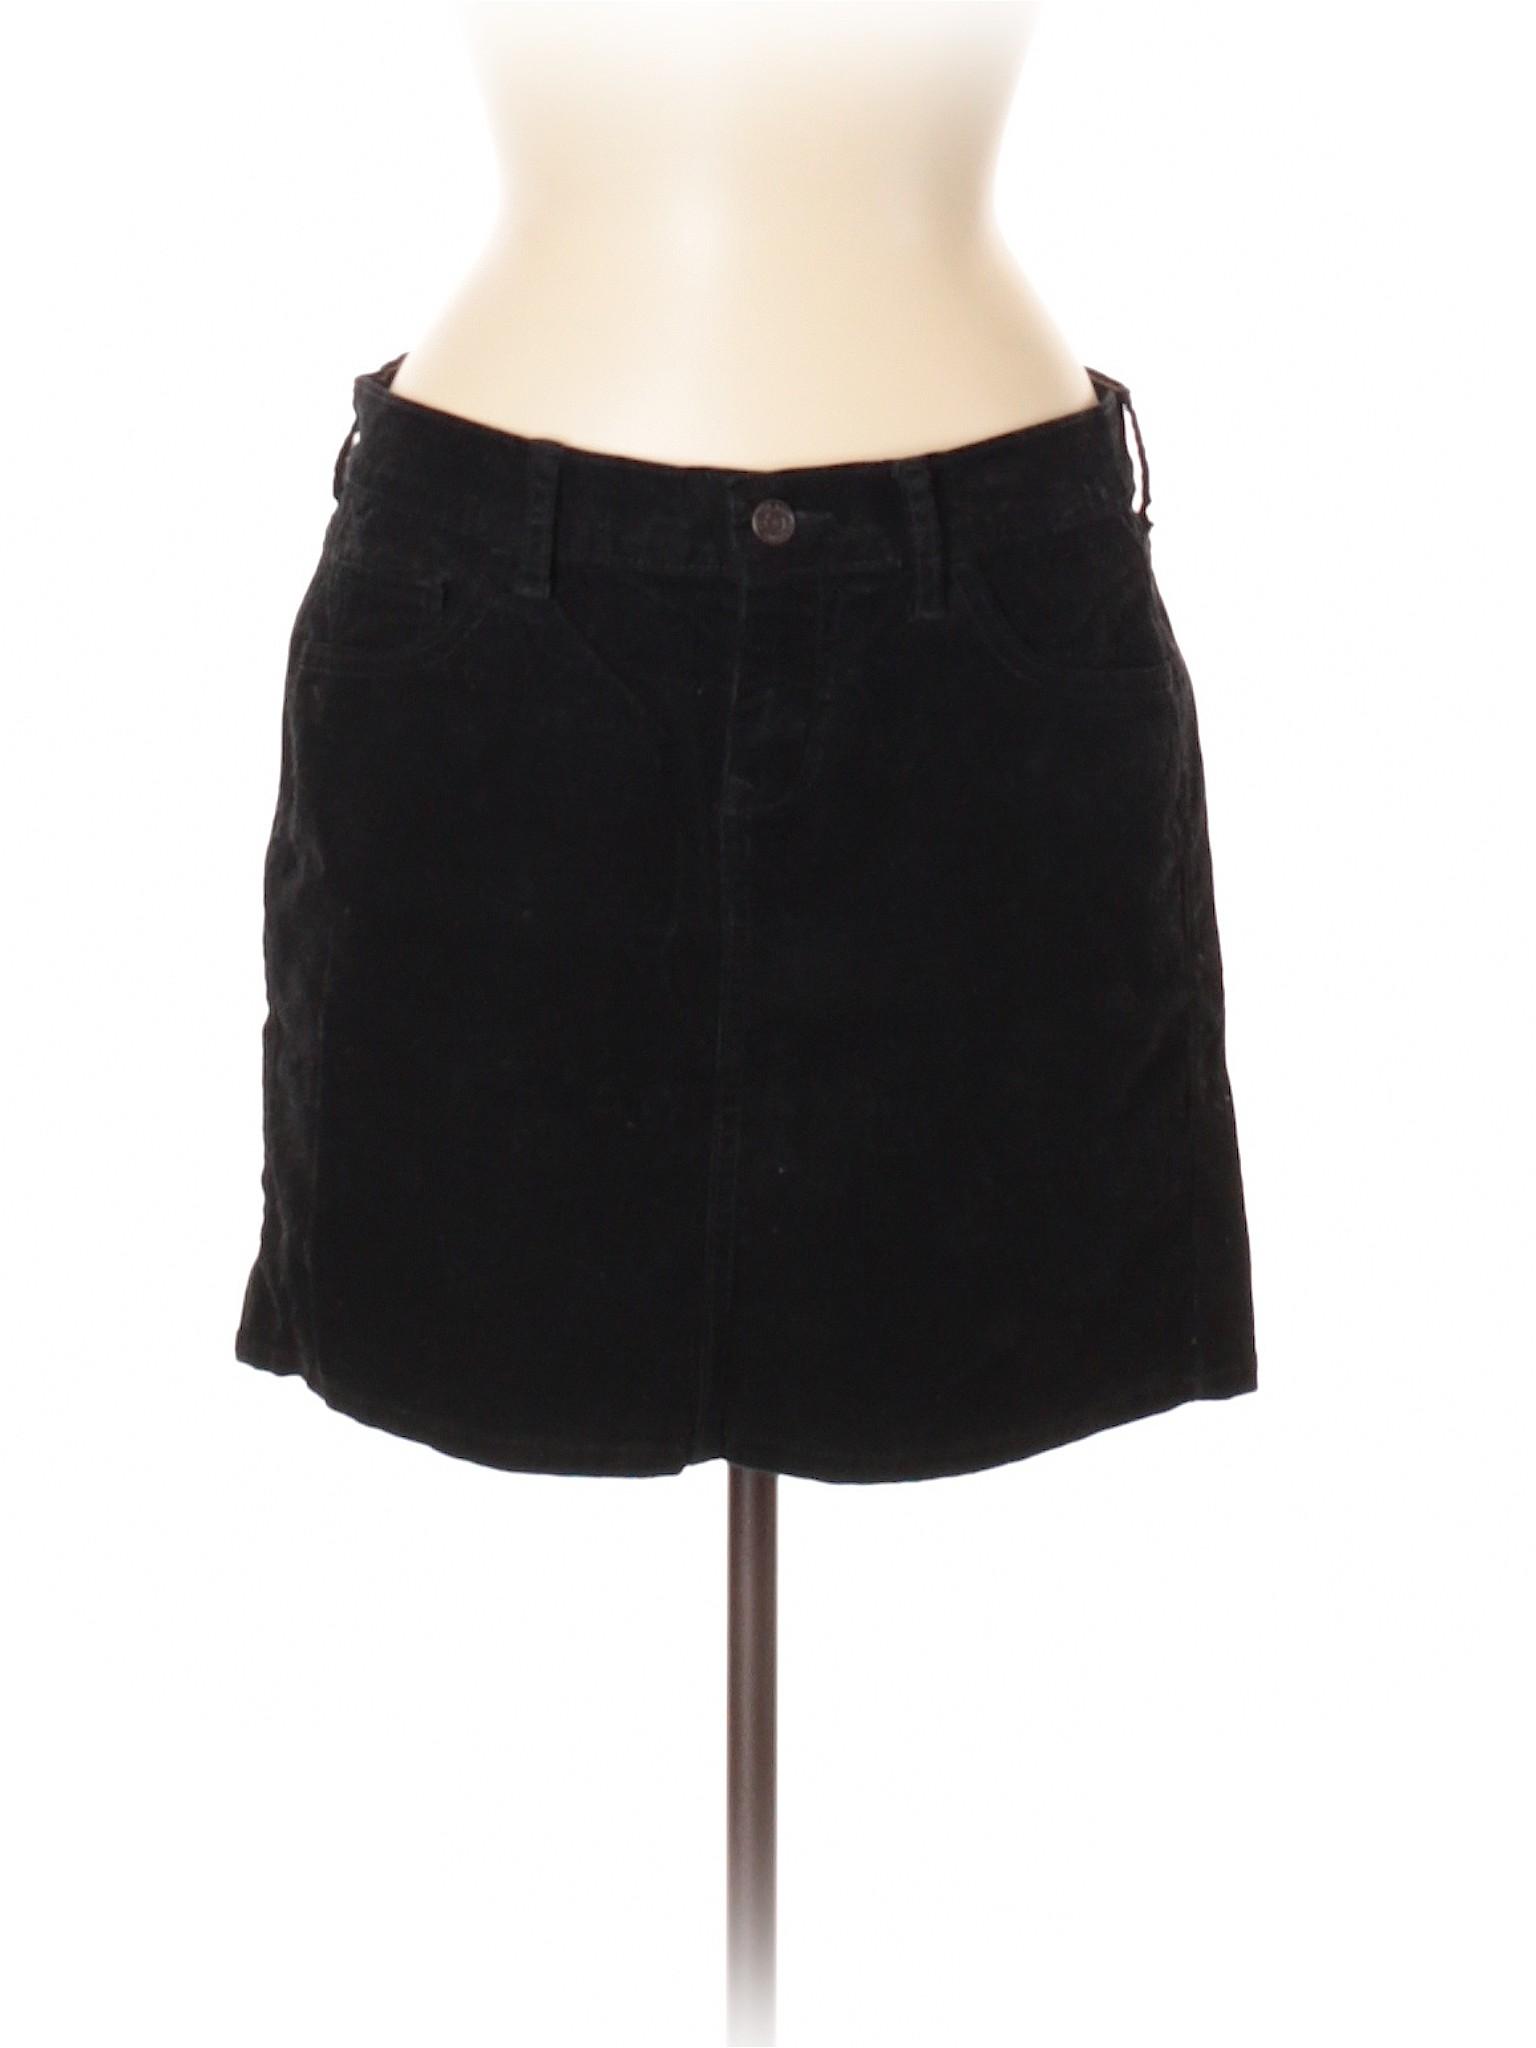 Casual Skirt Skirt Skirt Boutique Casual Casual Casual Boutique Skirt Boutique Skirt Boutique Casual Skirt Casual Boutique Boutique Boutique FXTAwR